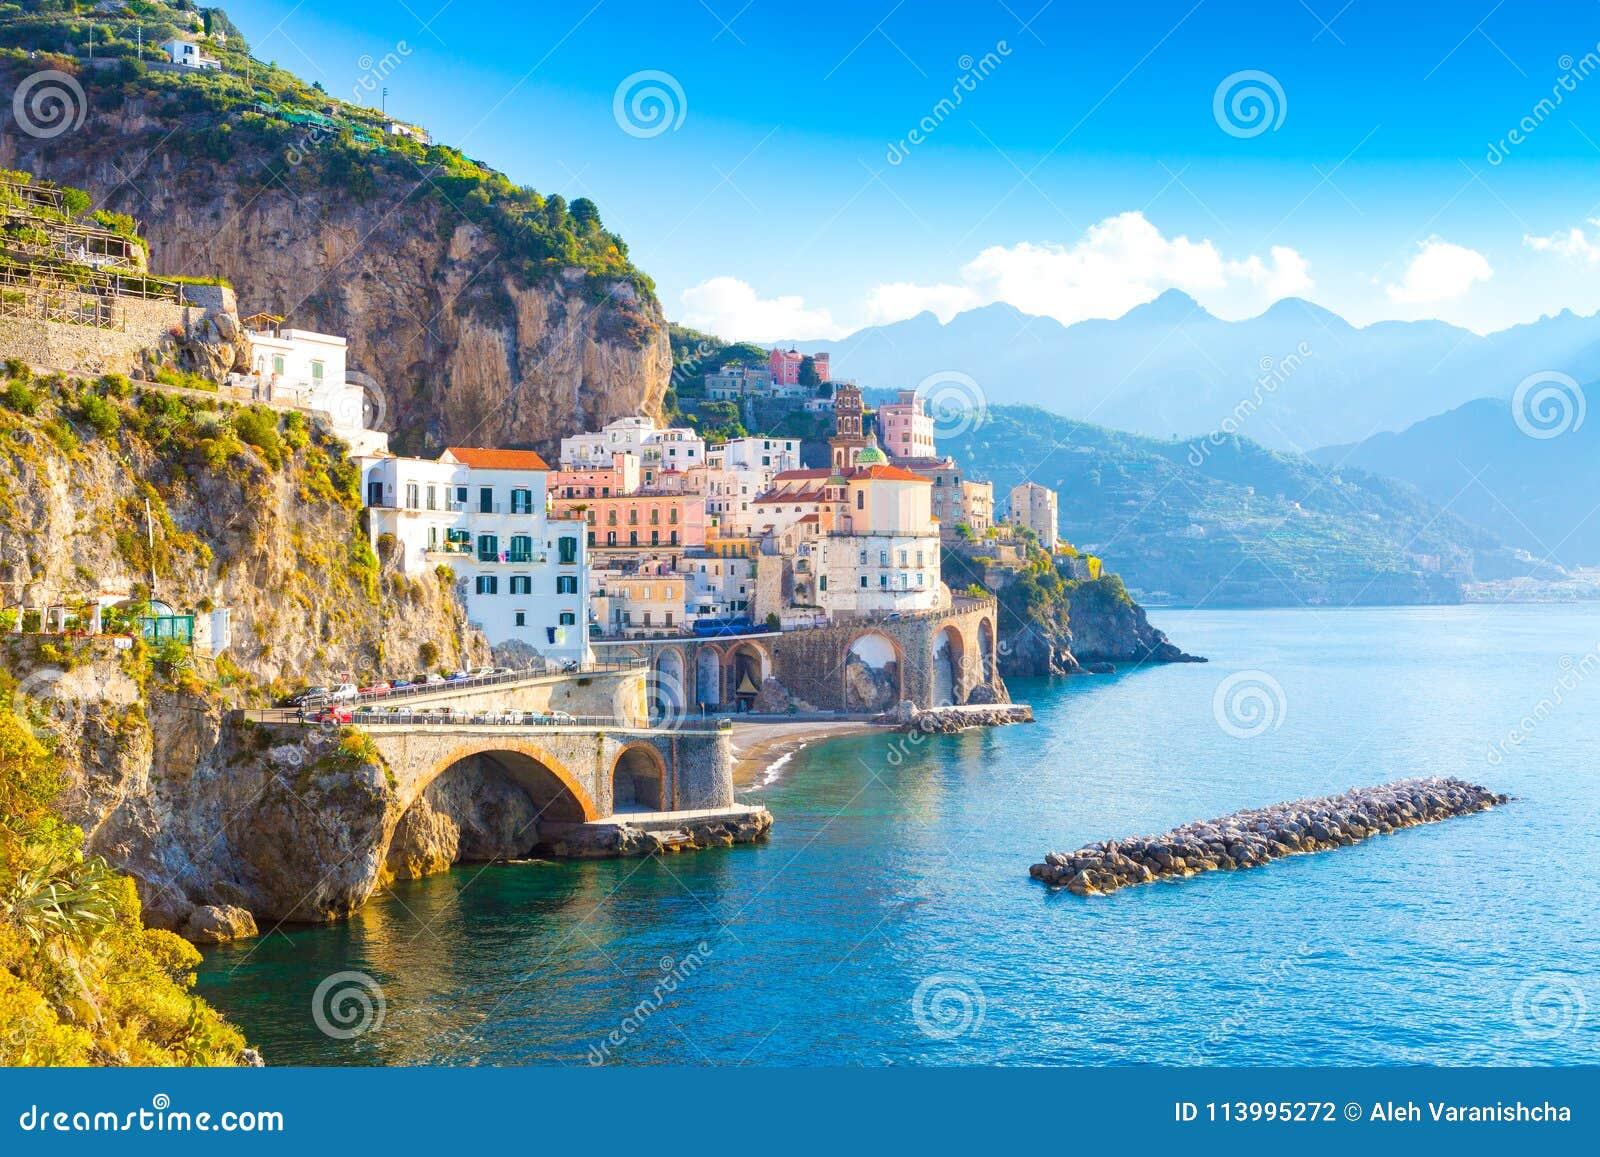 Paisaje urbano de Amalfi en la línea de la costa de mar Mediterráneo, Italia